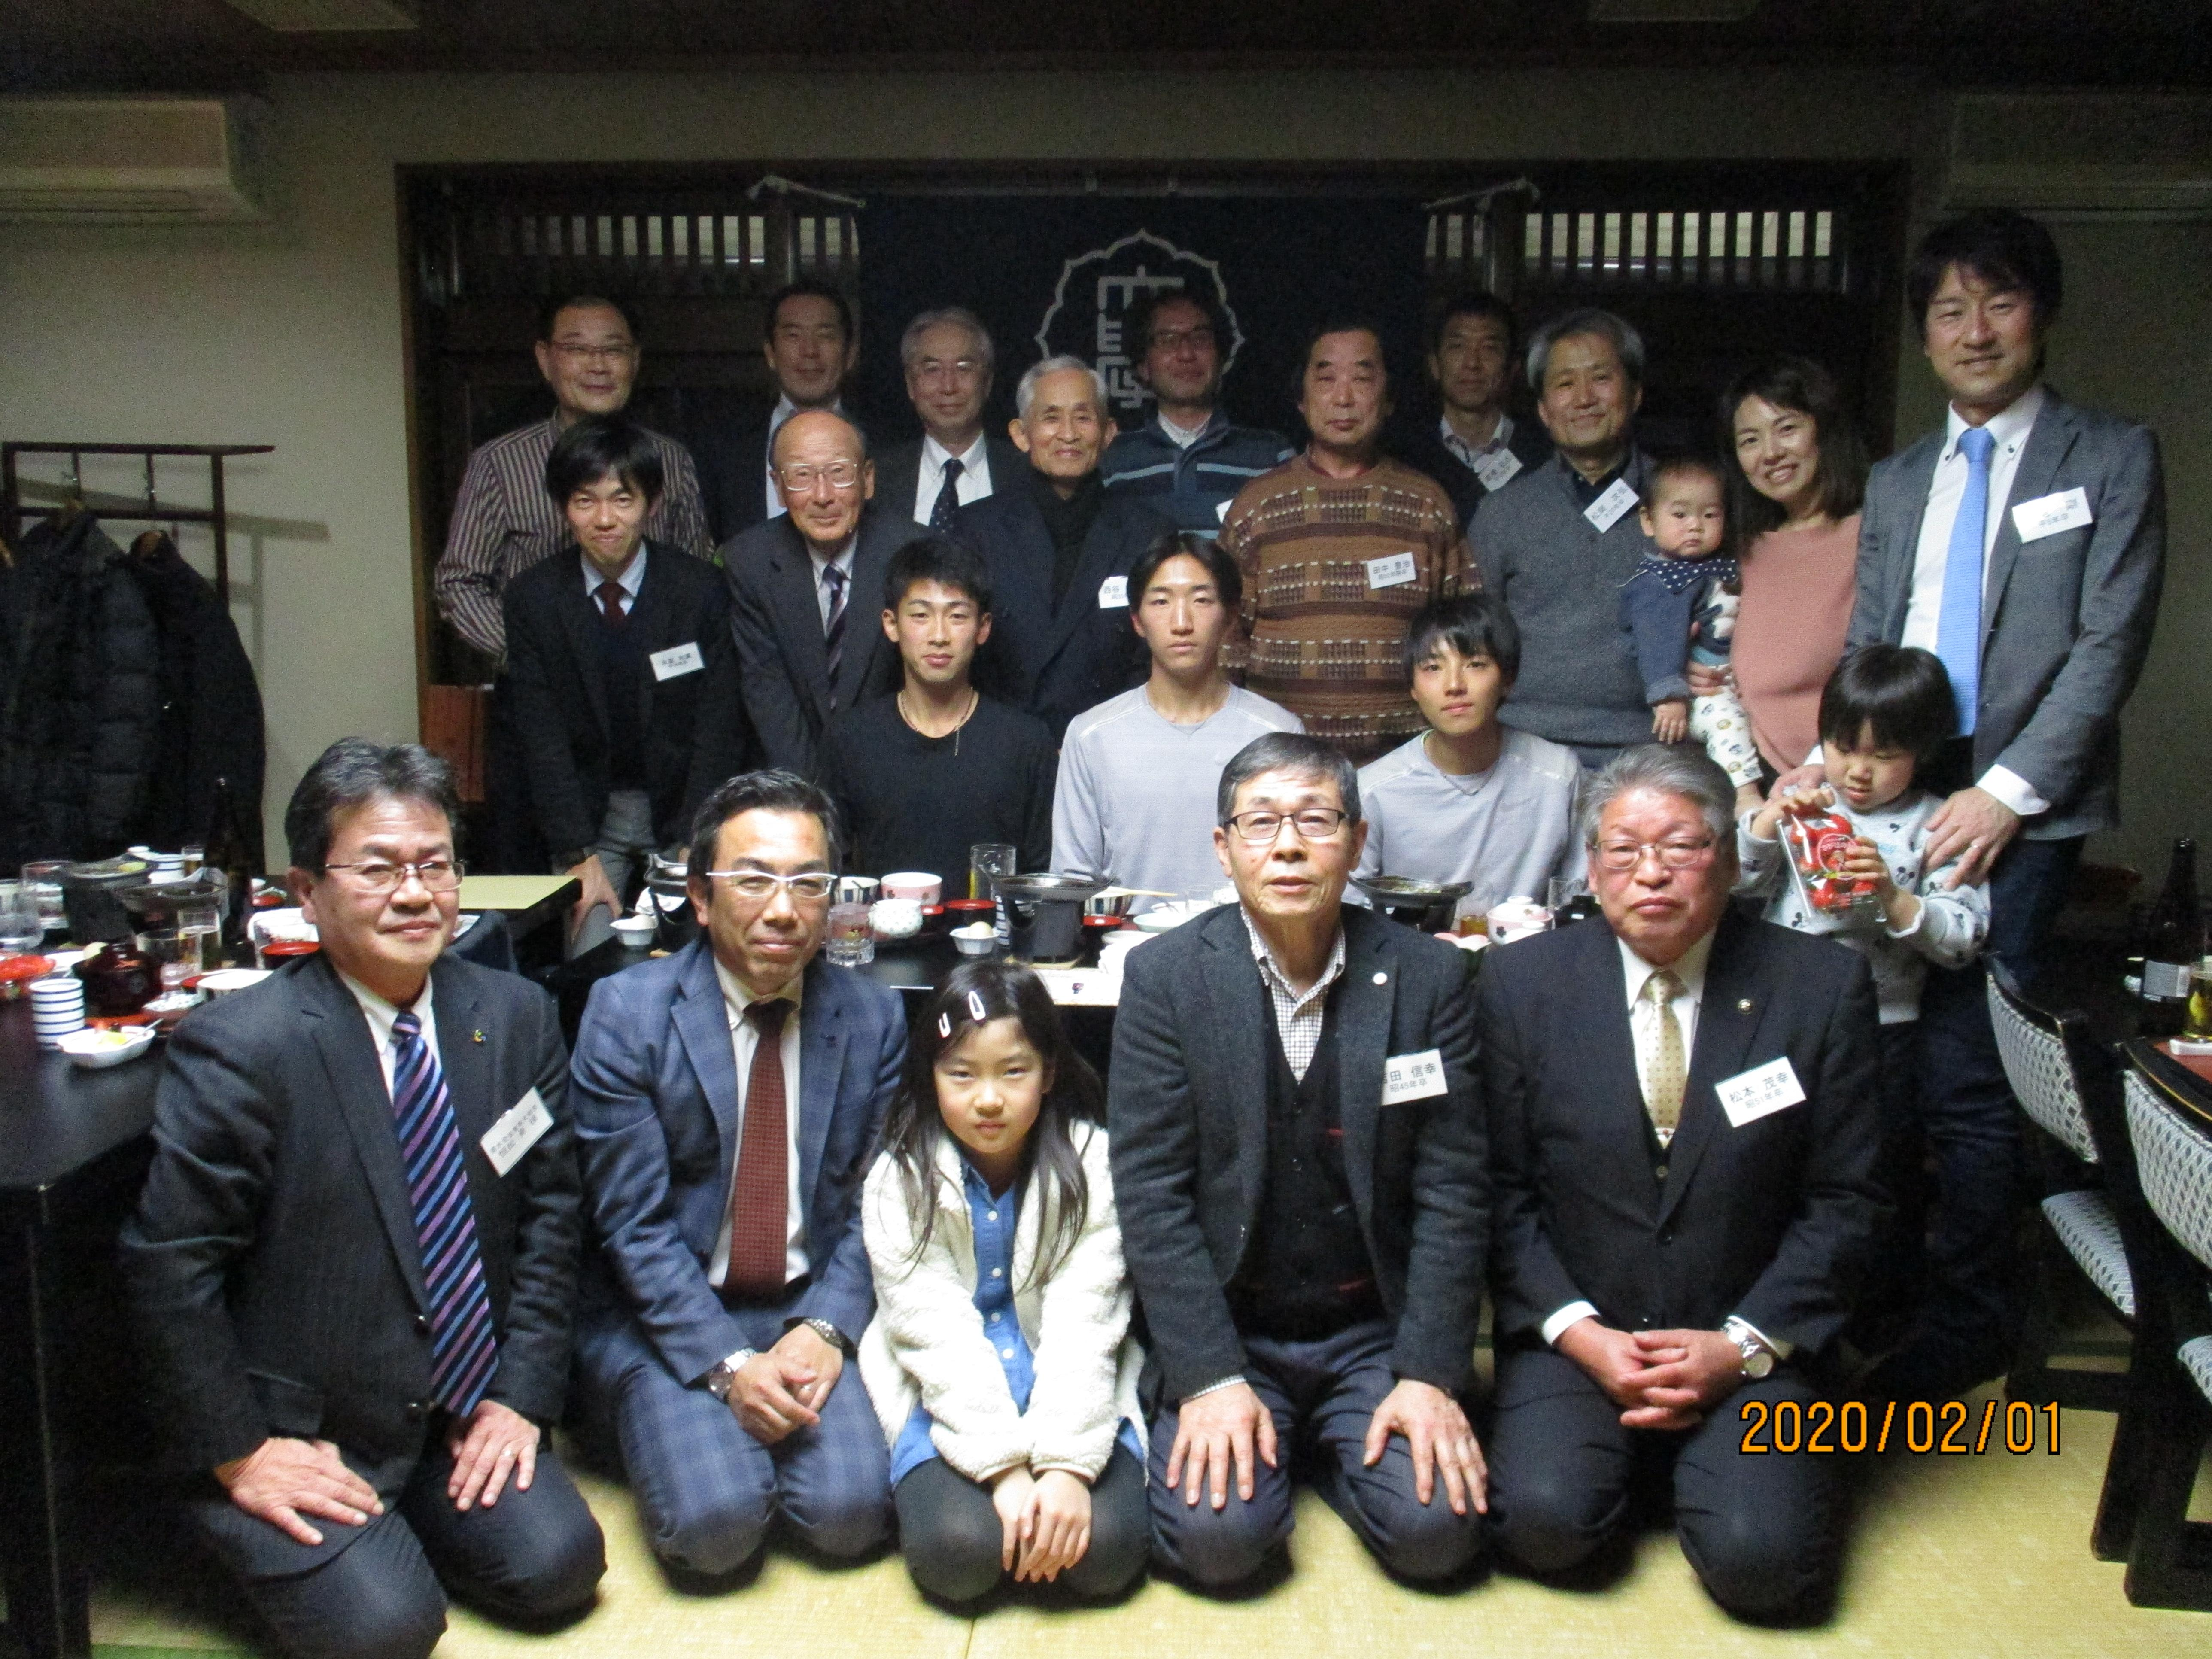 http://www.alumni-toyo.jp/branch/saga/4d40c07cbf6c46d5f4a9d487a0090637c2b7a833.JPG